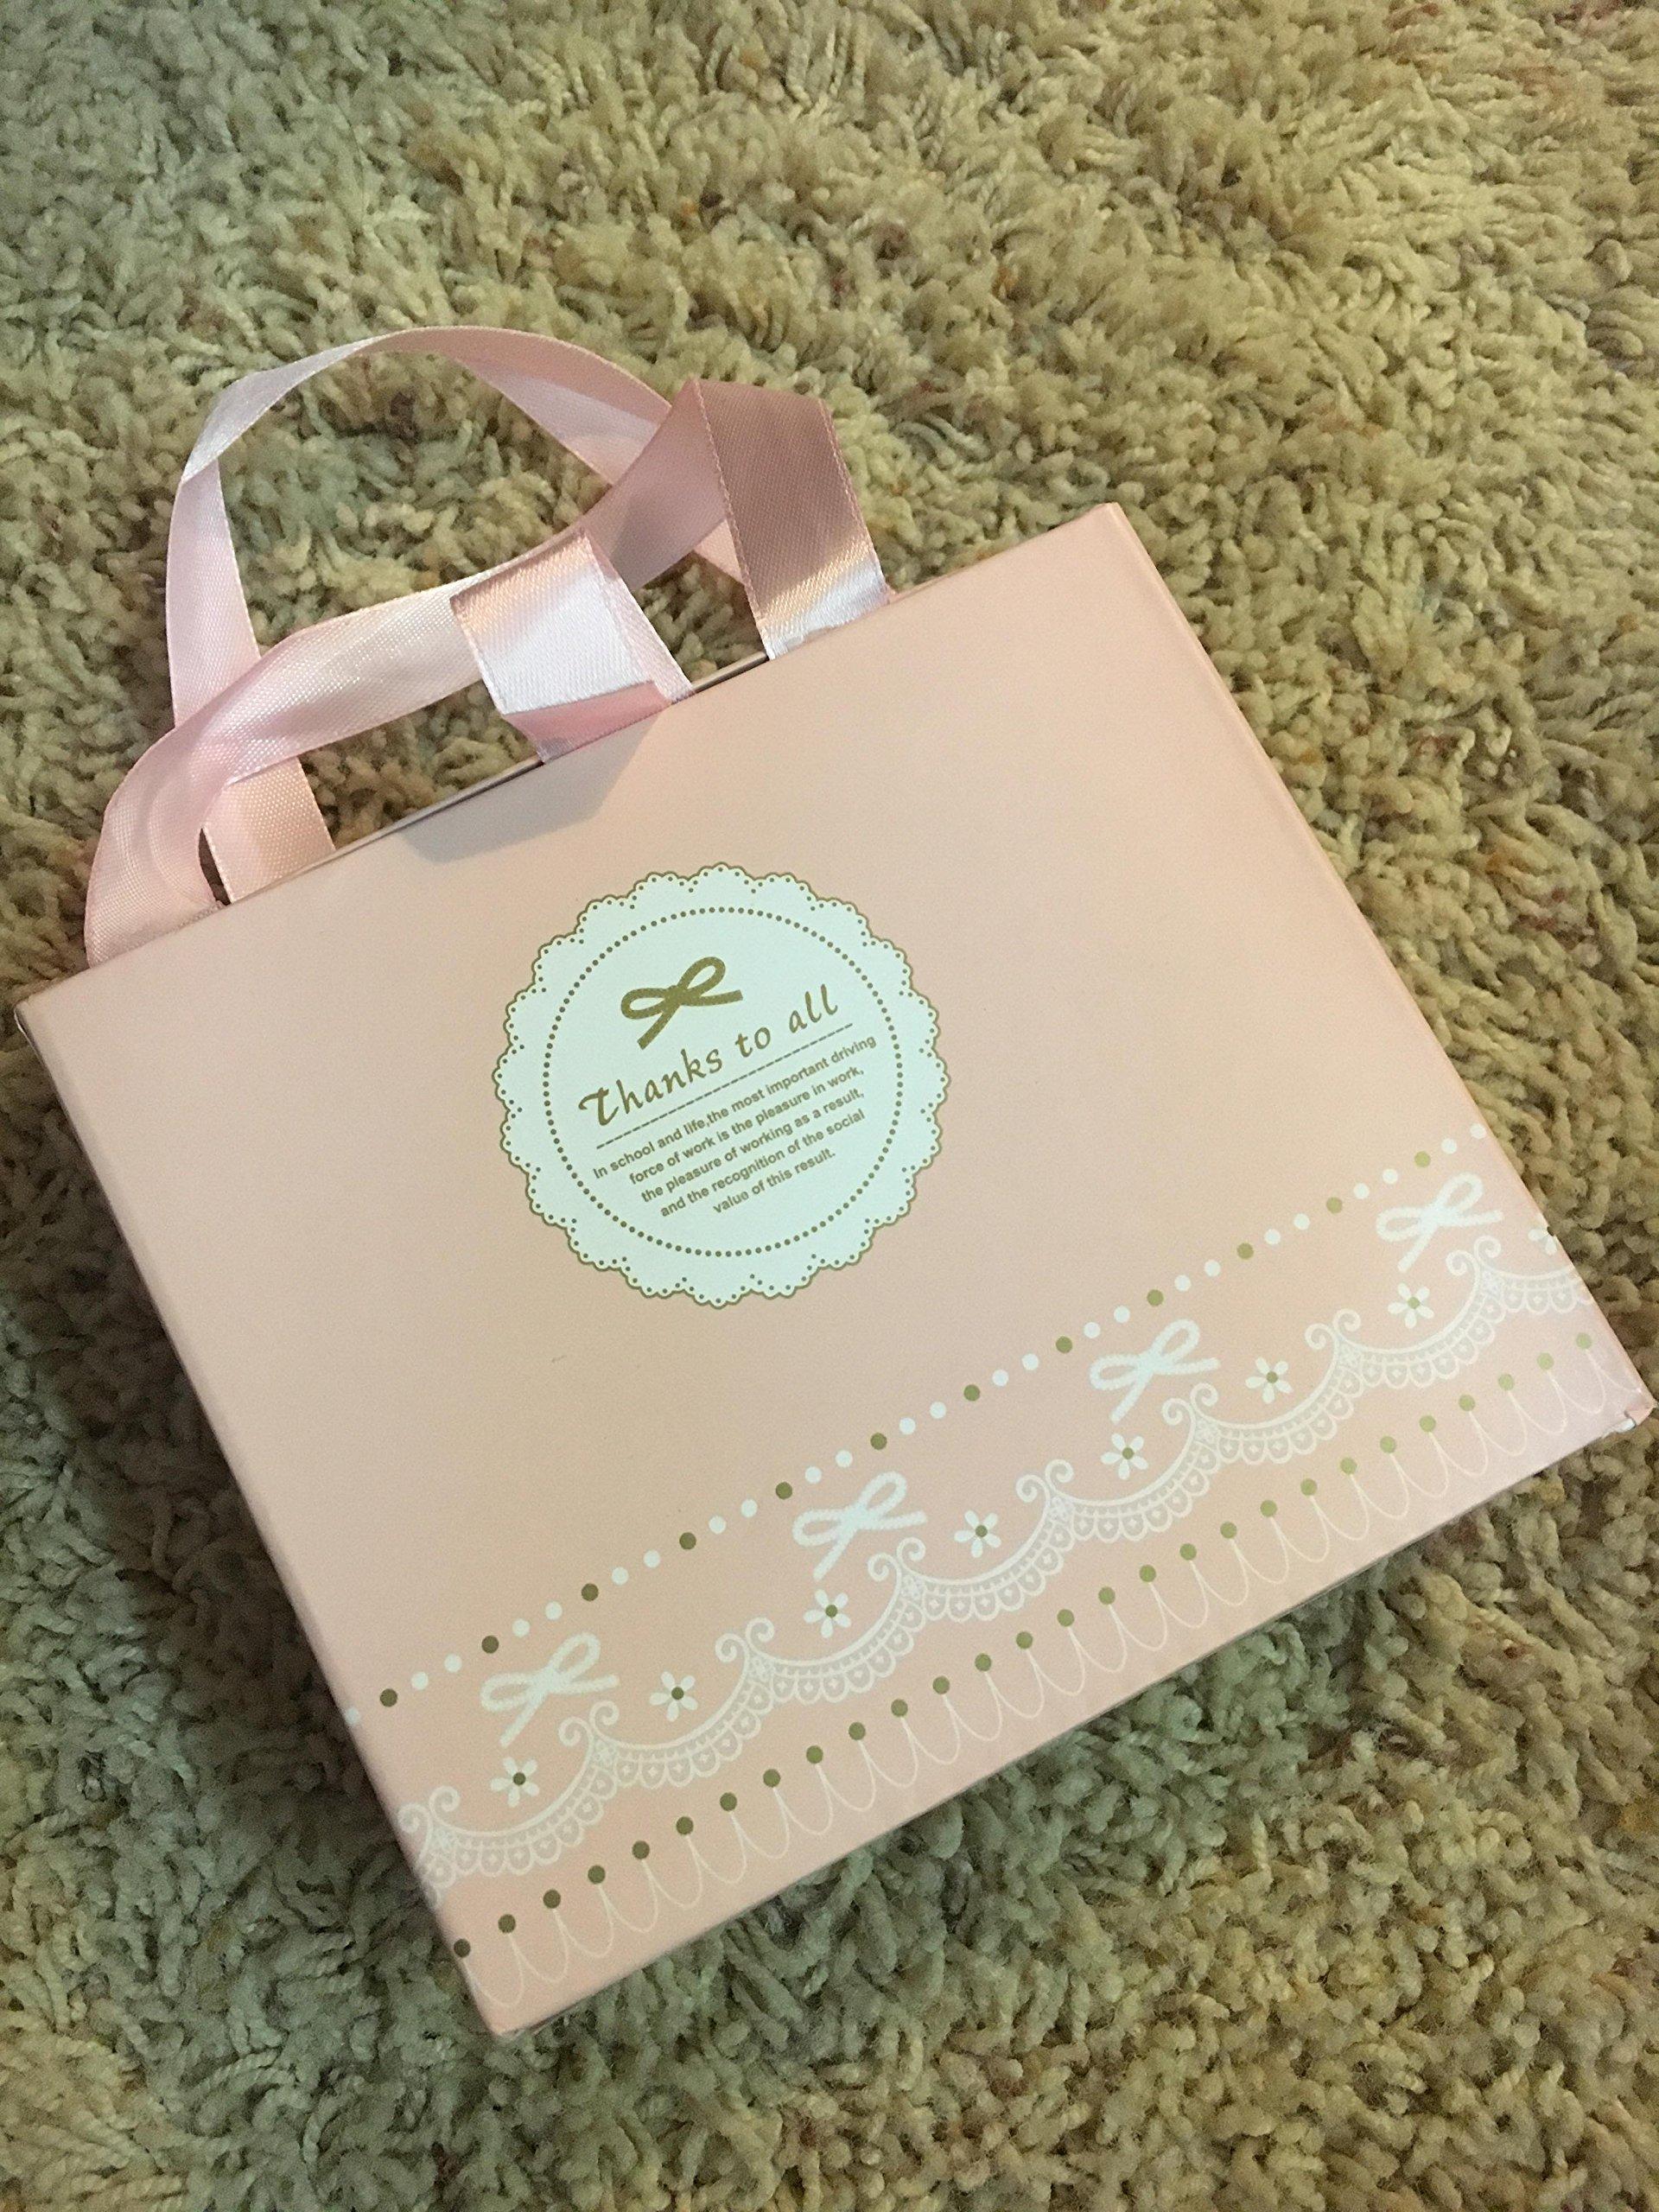 ? BOBORA ? Newborn Baby Girl Organic Anti Slip Socks + Girl's Flower Crown Headbands Sets with Gift Box- Best Baby Shower Gift by BOBORA (Image #6)